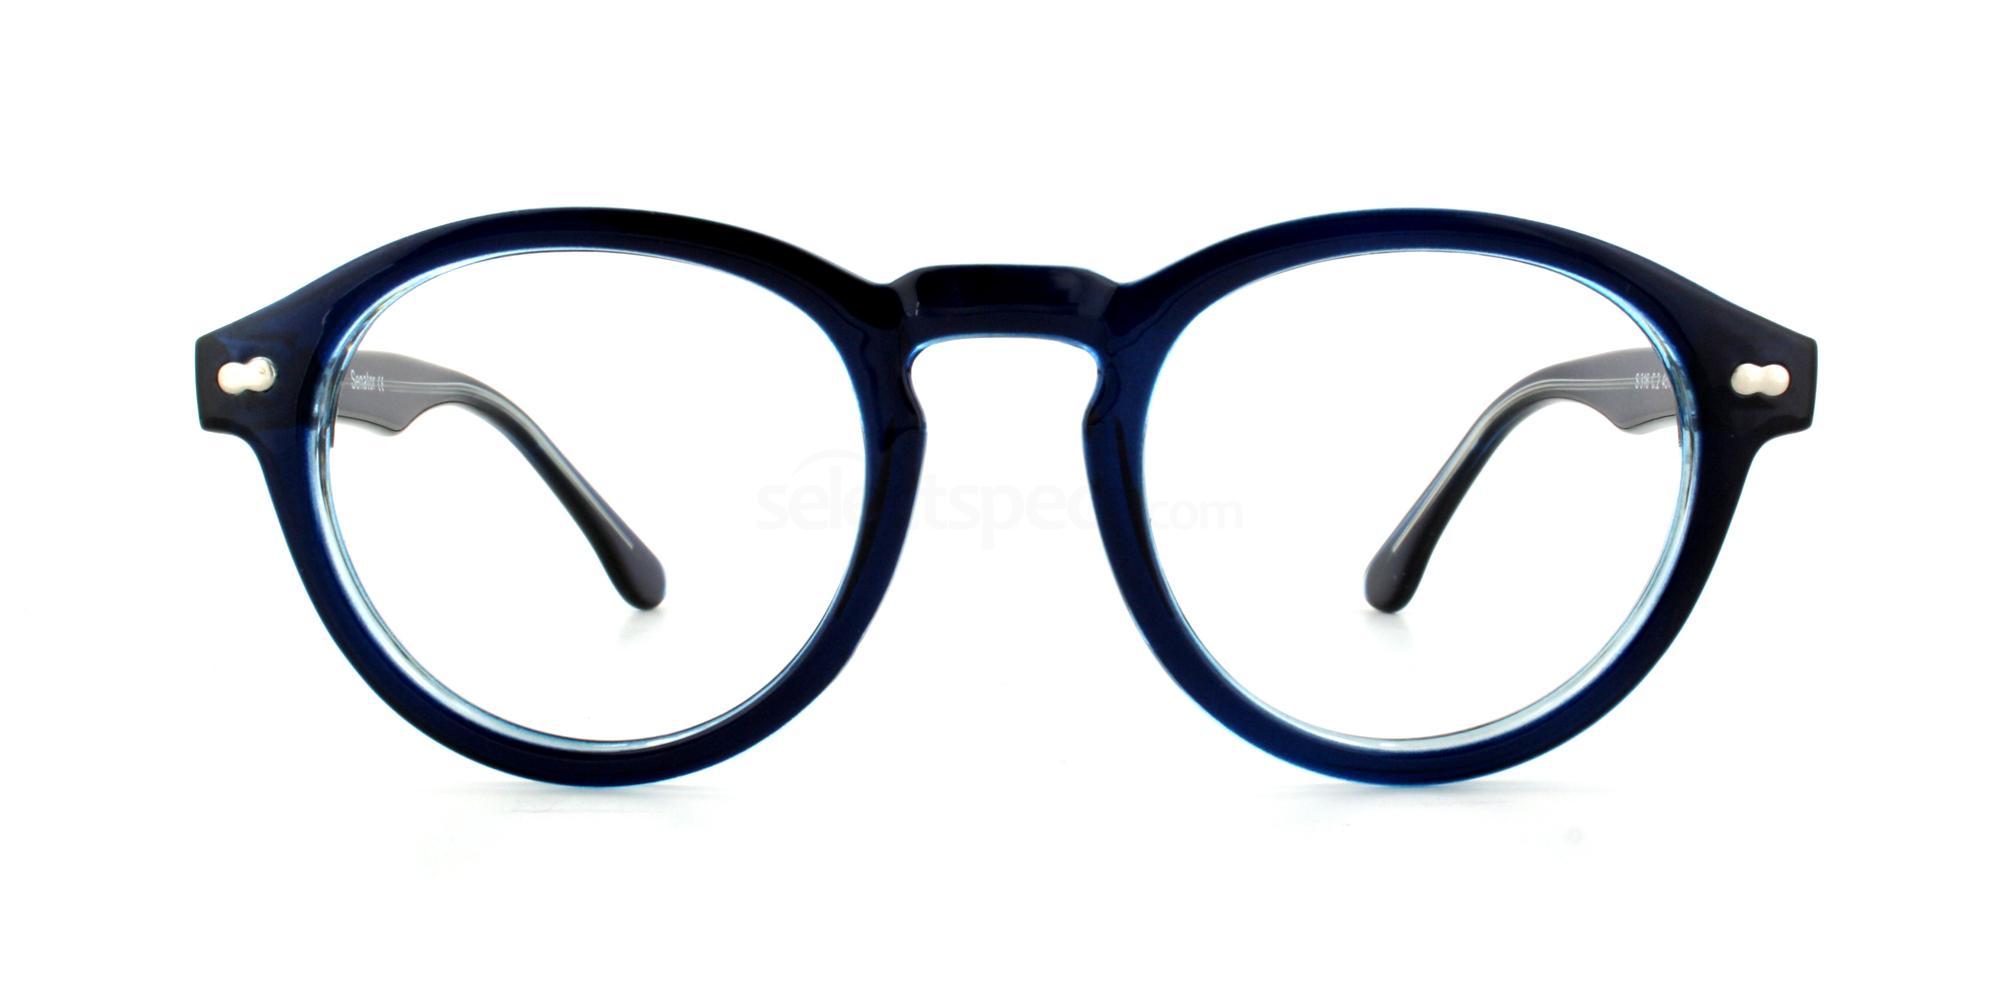 C2 SENATOR 316 Glasses, Senator